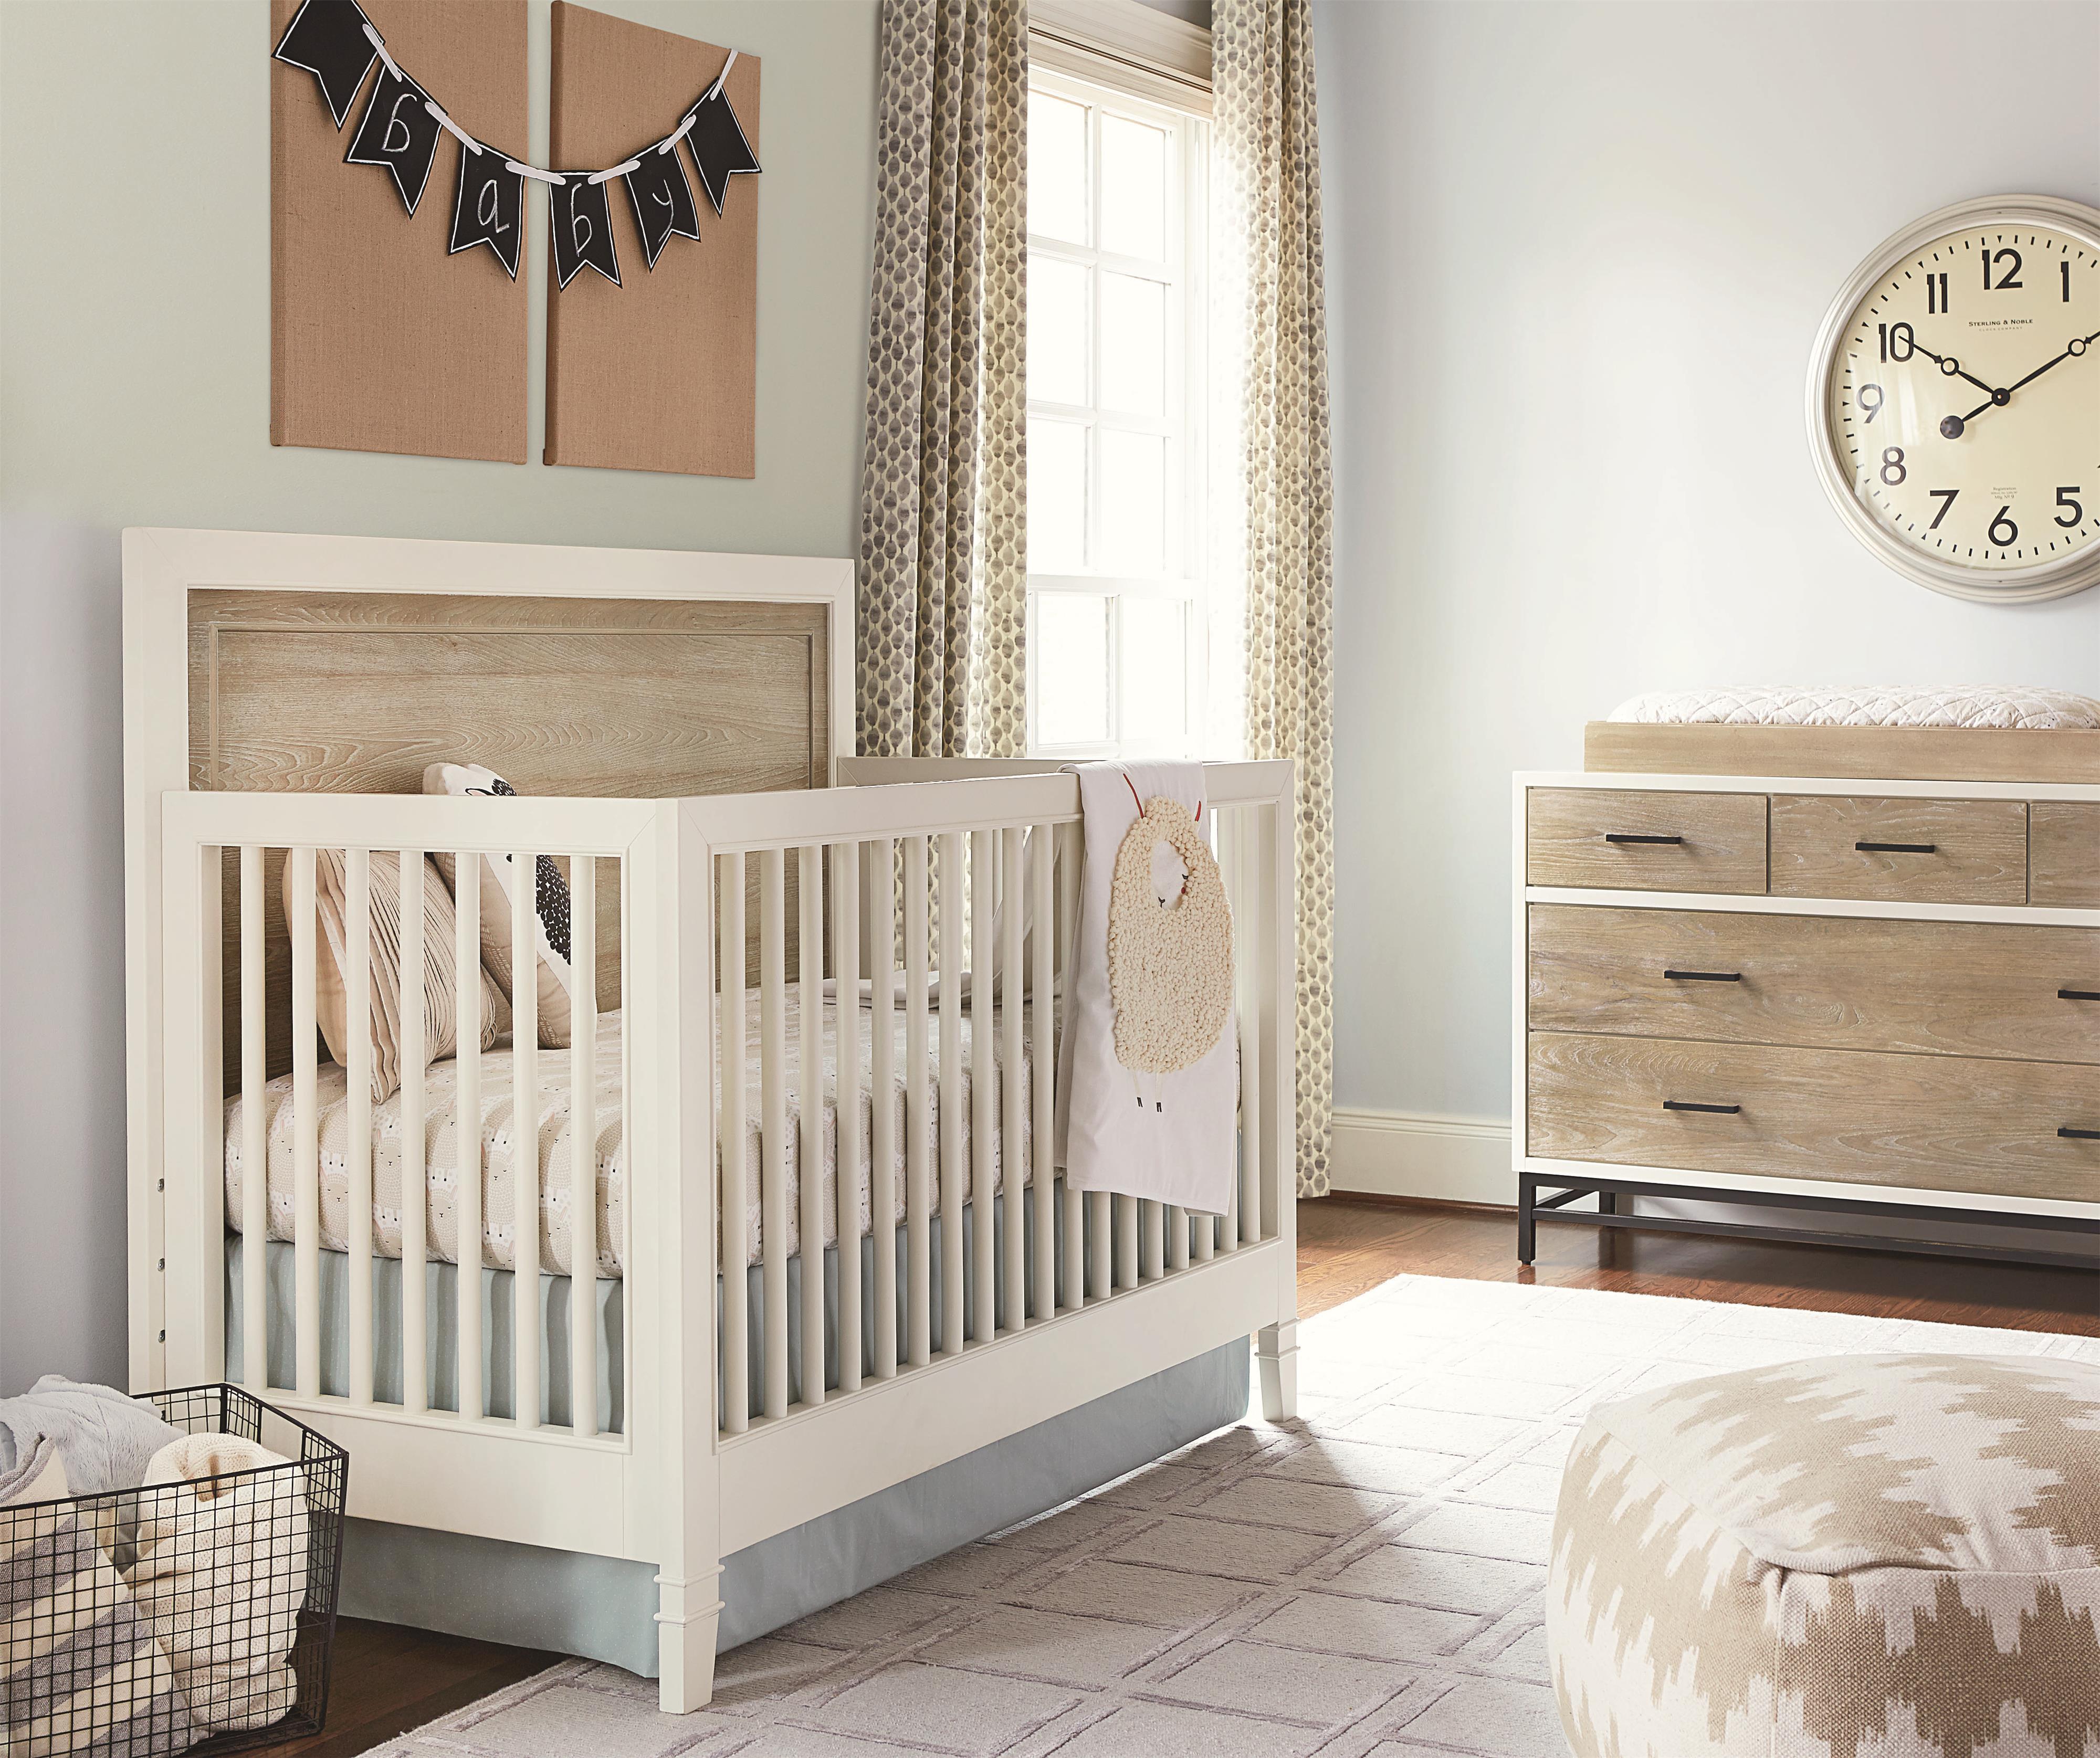 Smartstuff #myRoom Crib Bedroom Group - Item Number: 5321 C Bedroom Group 7